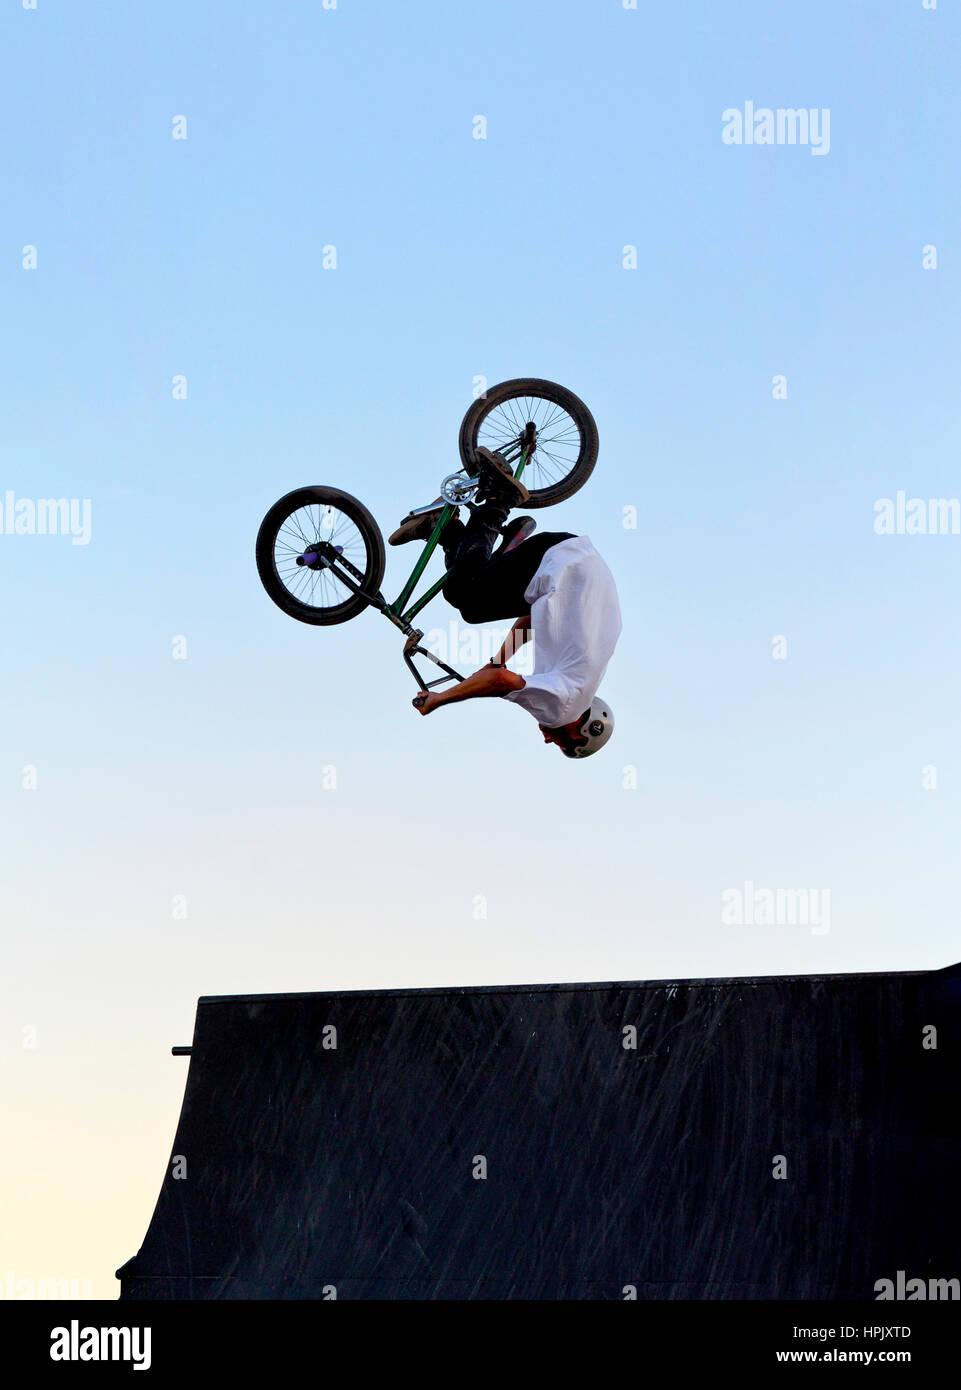 Una persona que realiza un back flip a través de una rampa de saltos de bicicleta en una bicicleta BMX Imagen De Stock